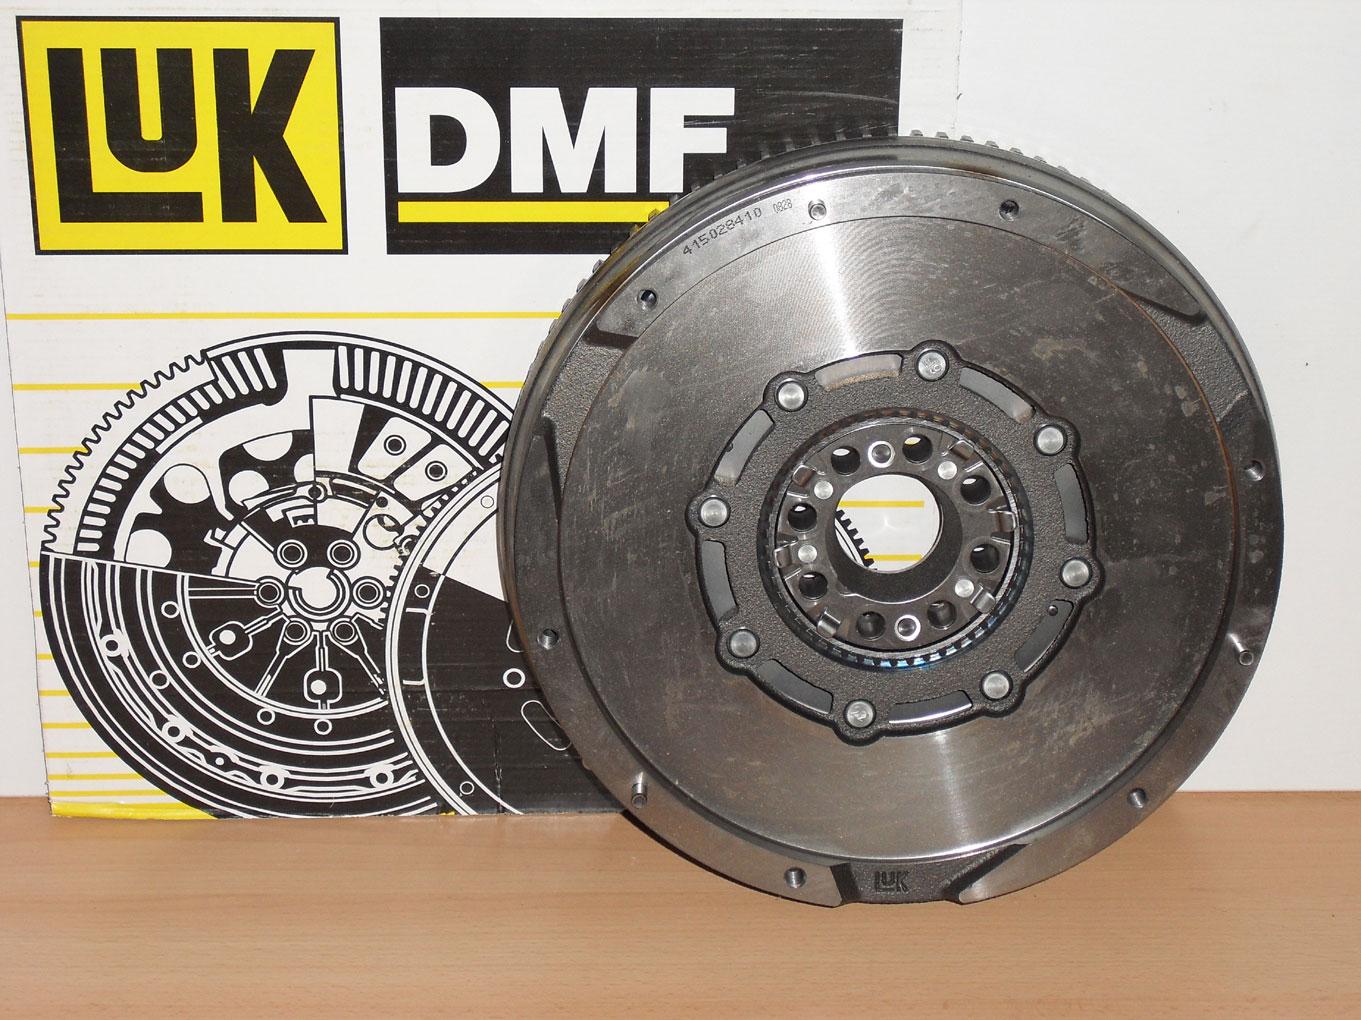 LuK 415 0335 10 Zms Volante Motor